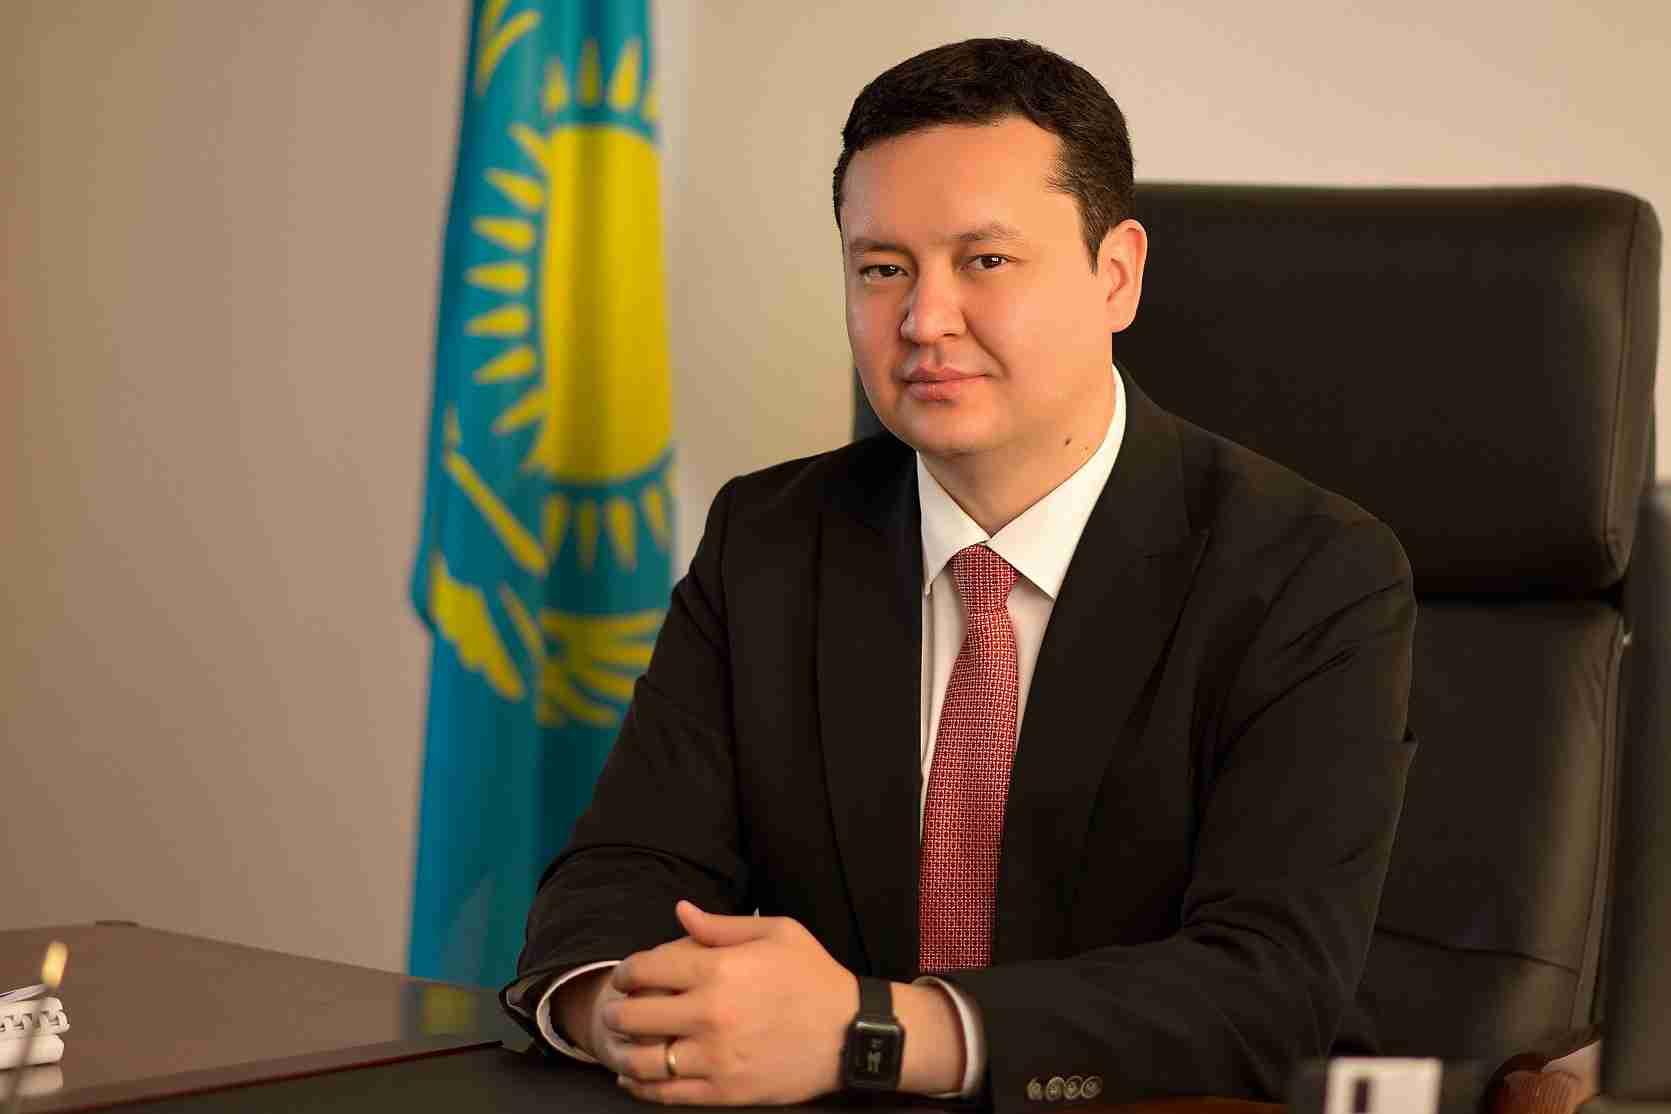 Арест вице-министра Олжаса Абишева: детали коррупционного скандала